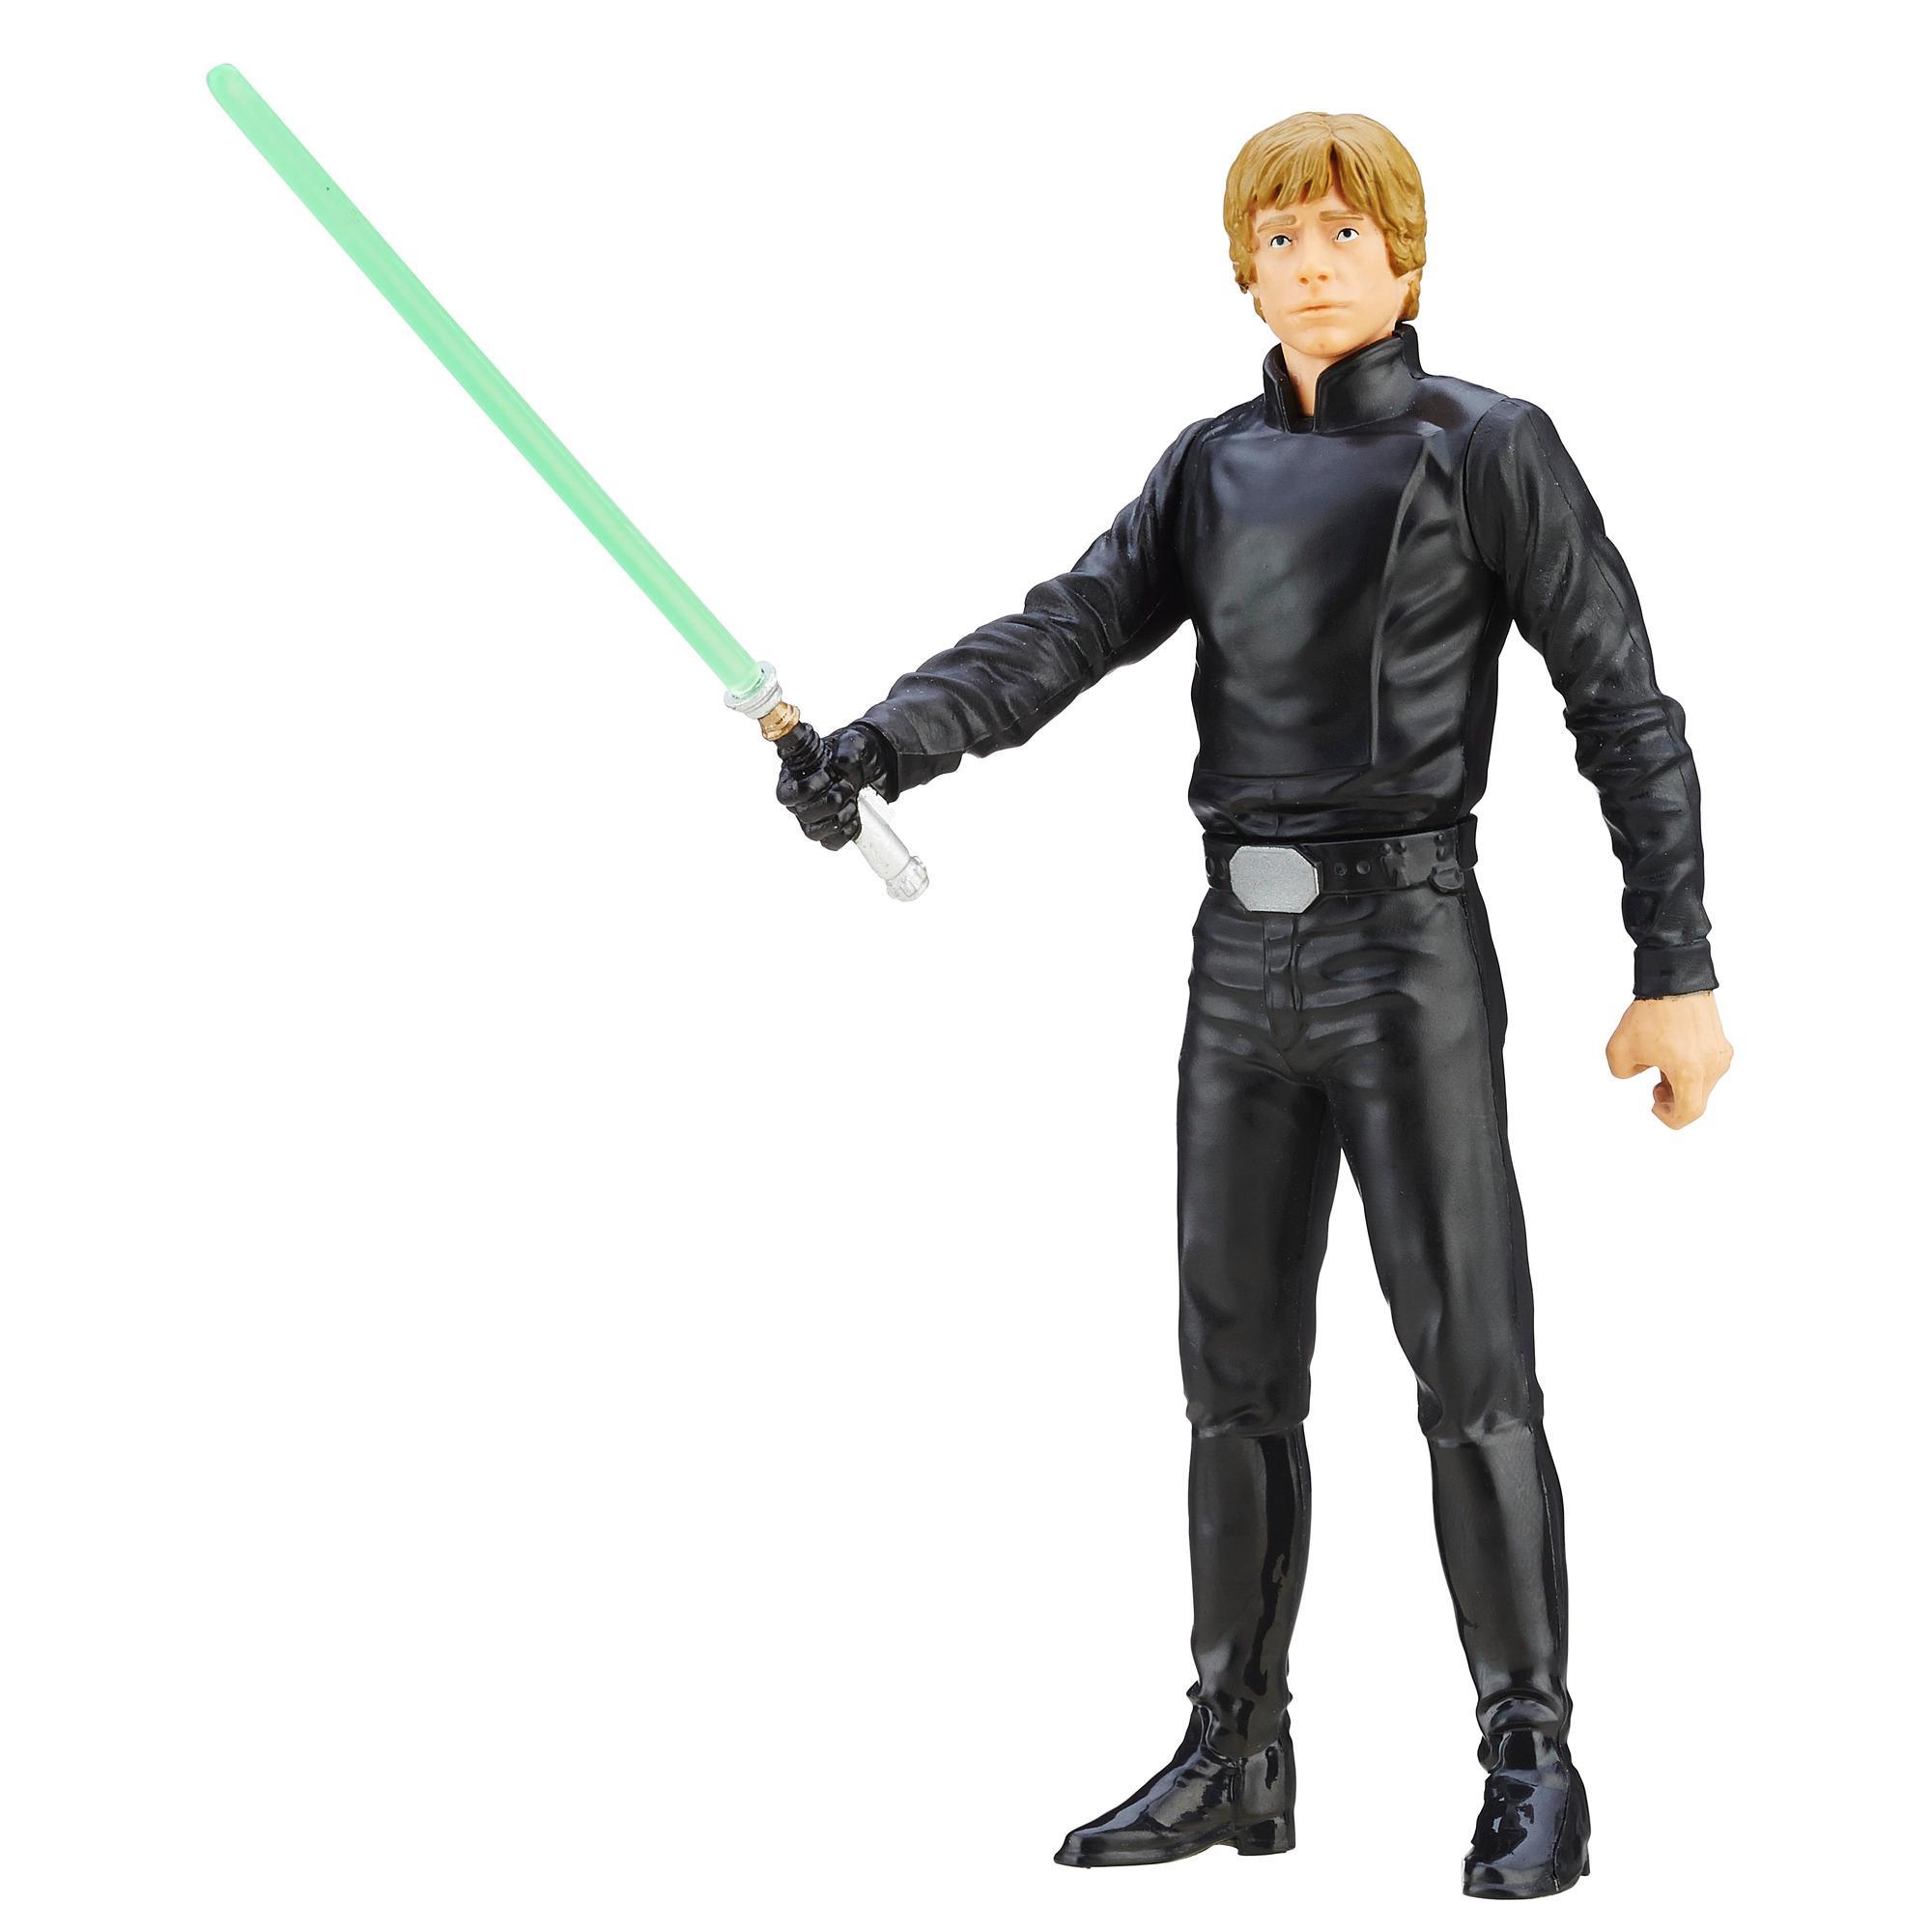 Star Wars Episode VI  Luke Skywalker